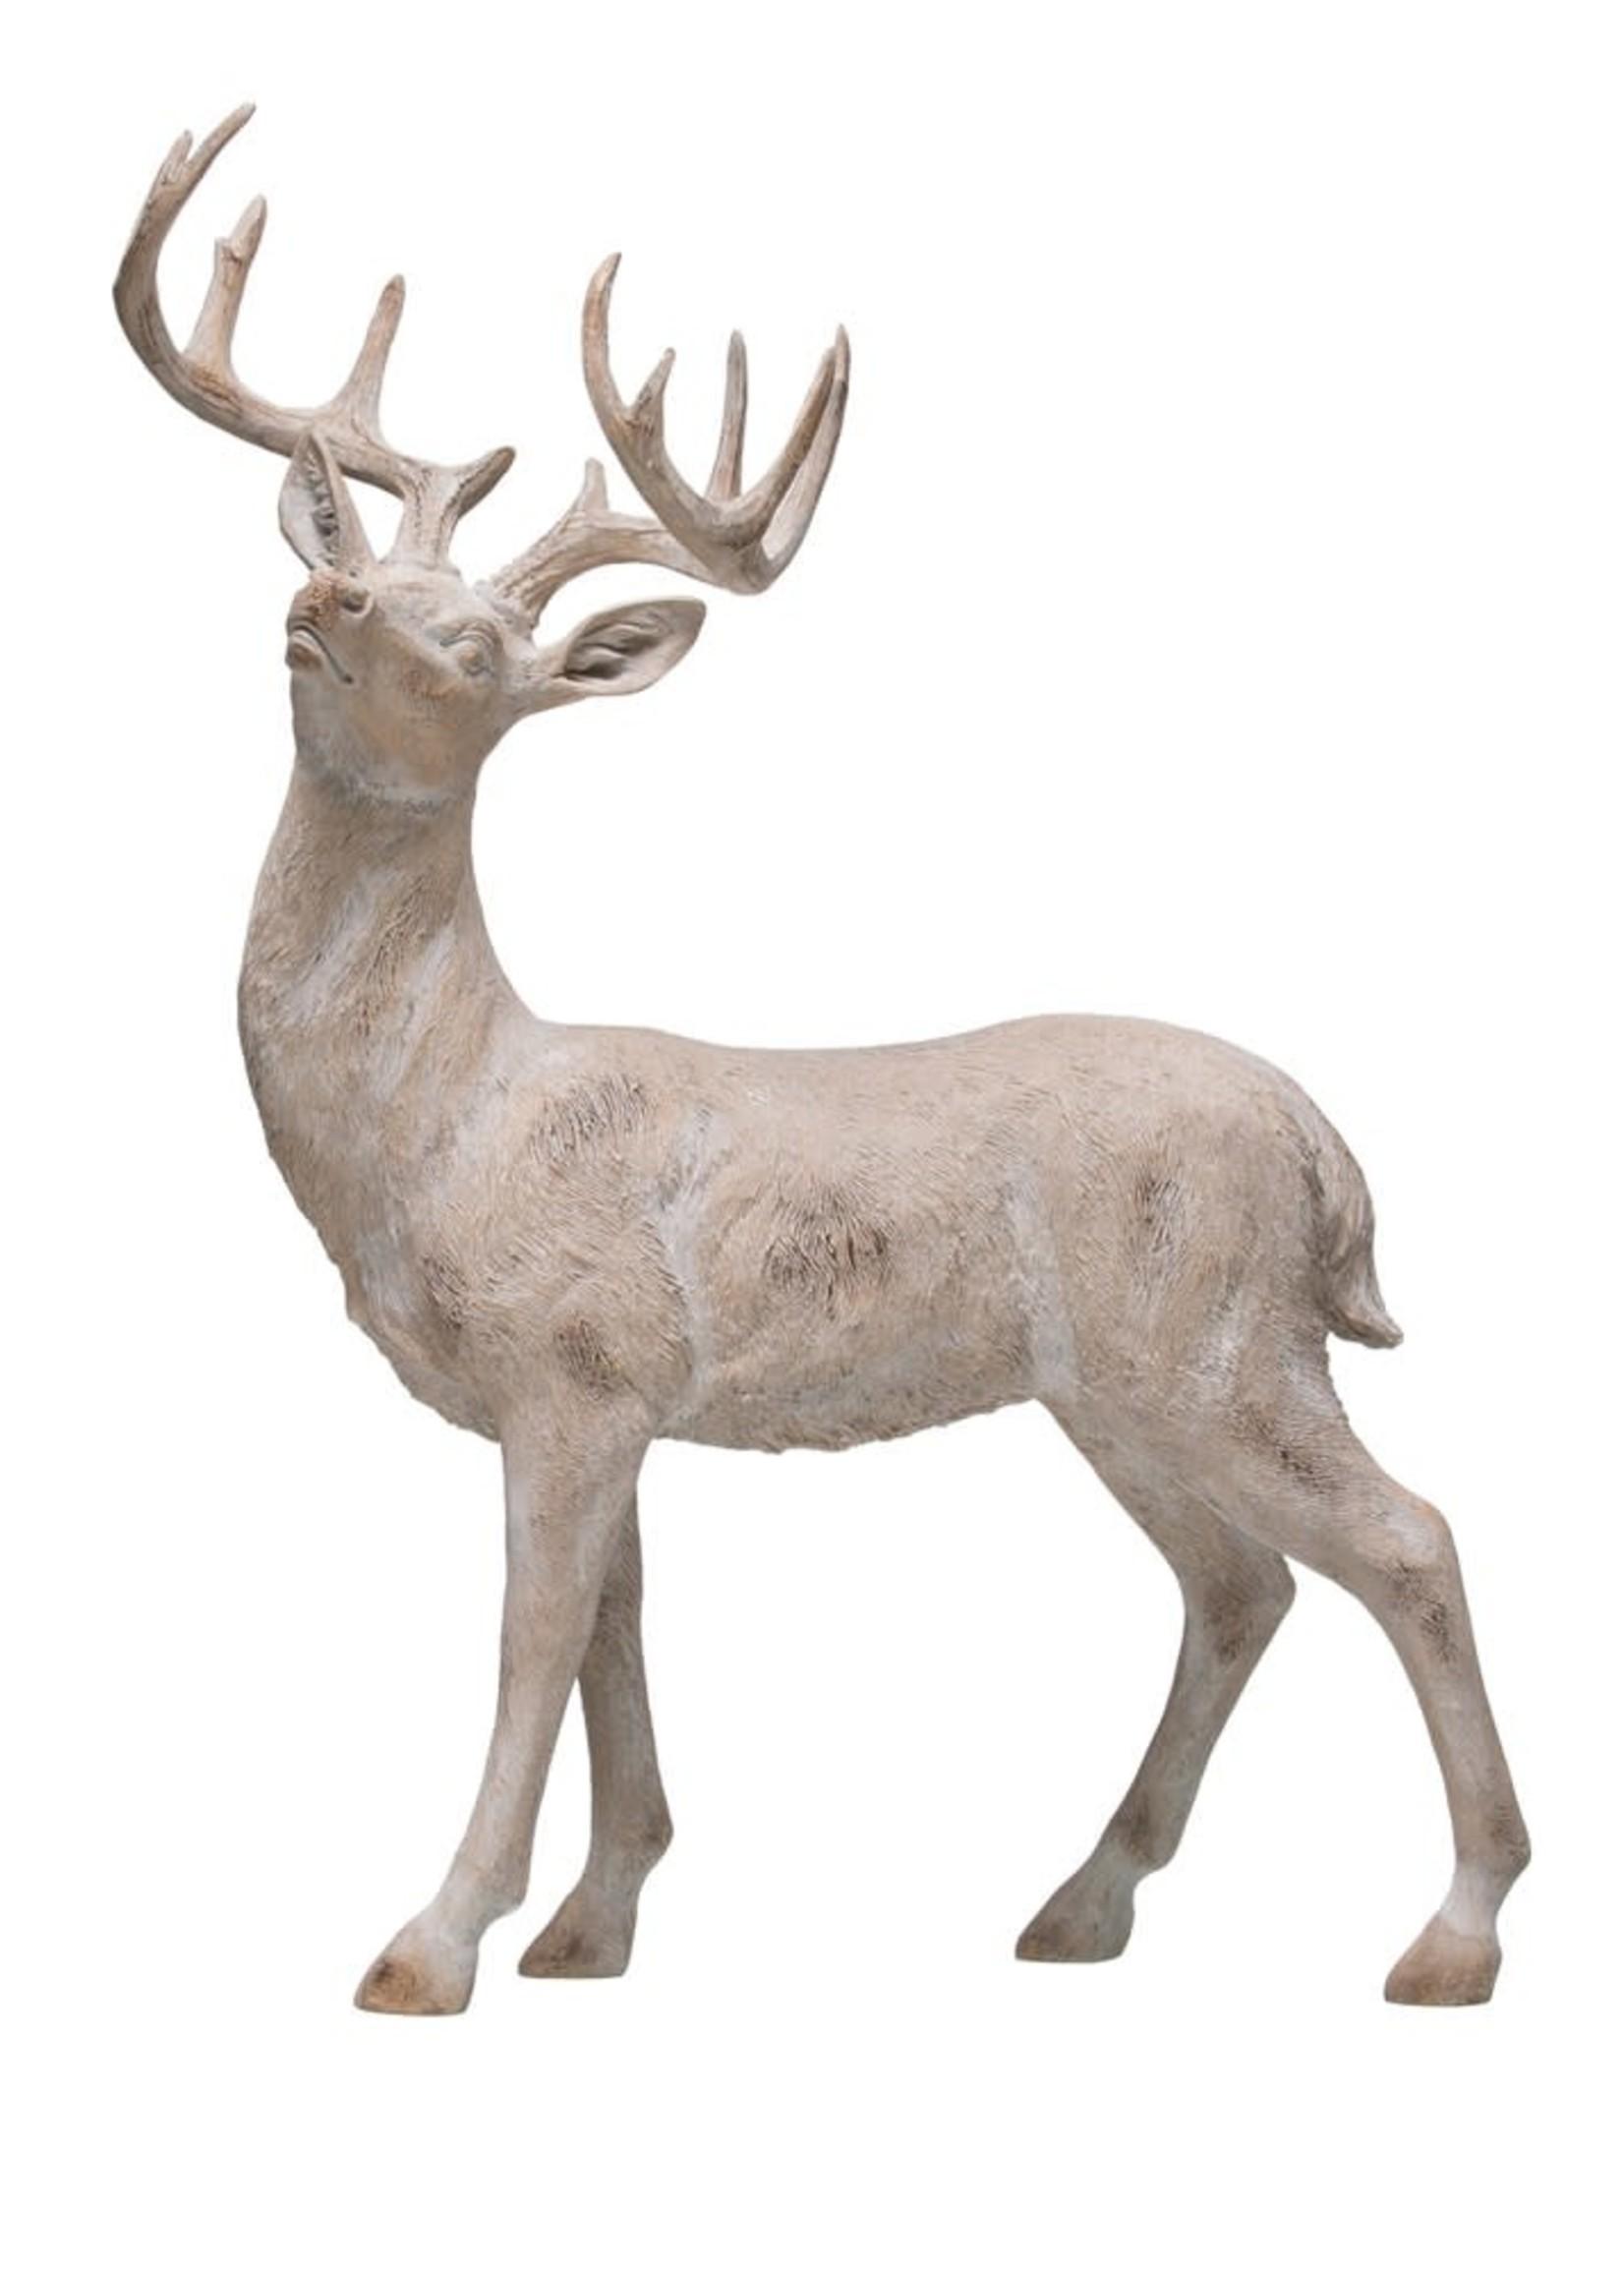 "15-3/4""L x 20-1/2""H Resin Standing Deer, Whitewash Finish"